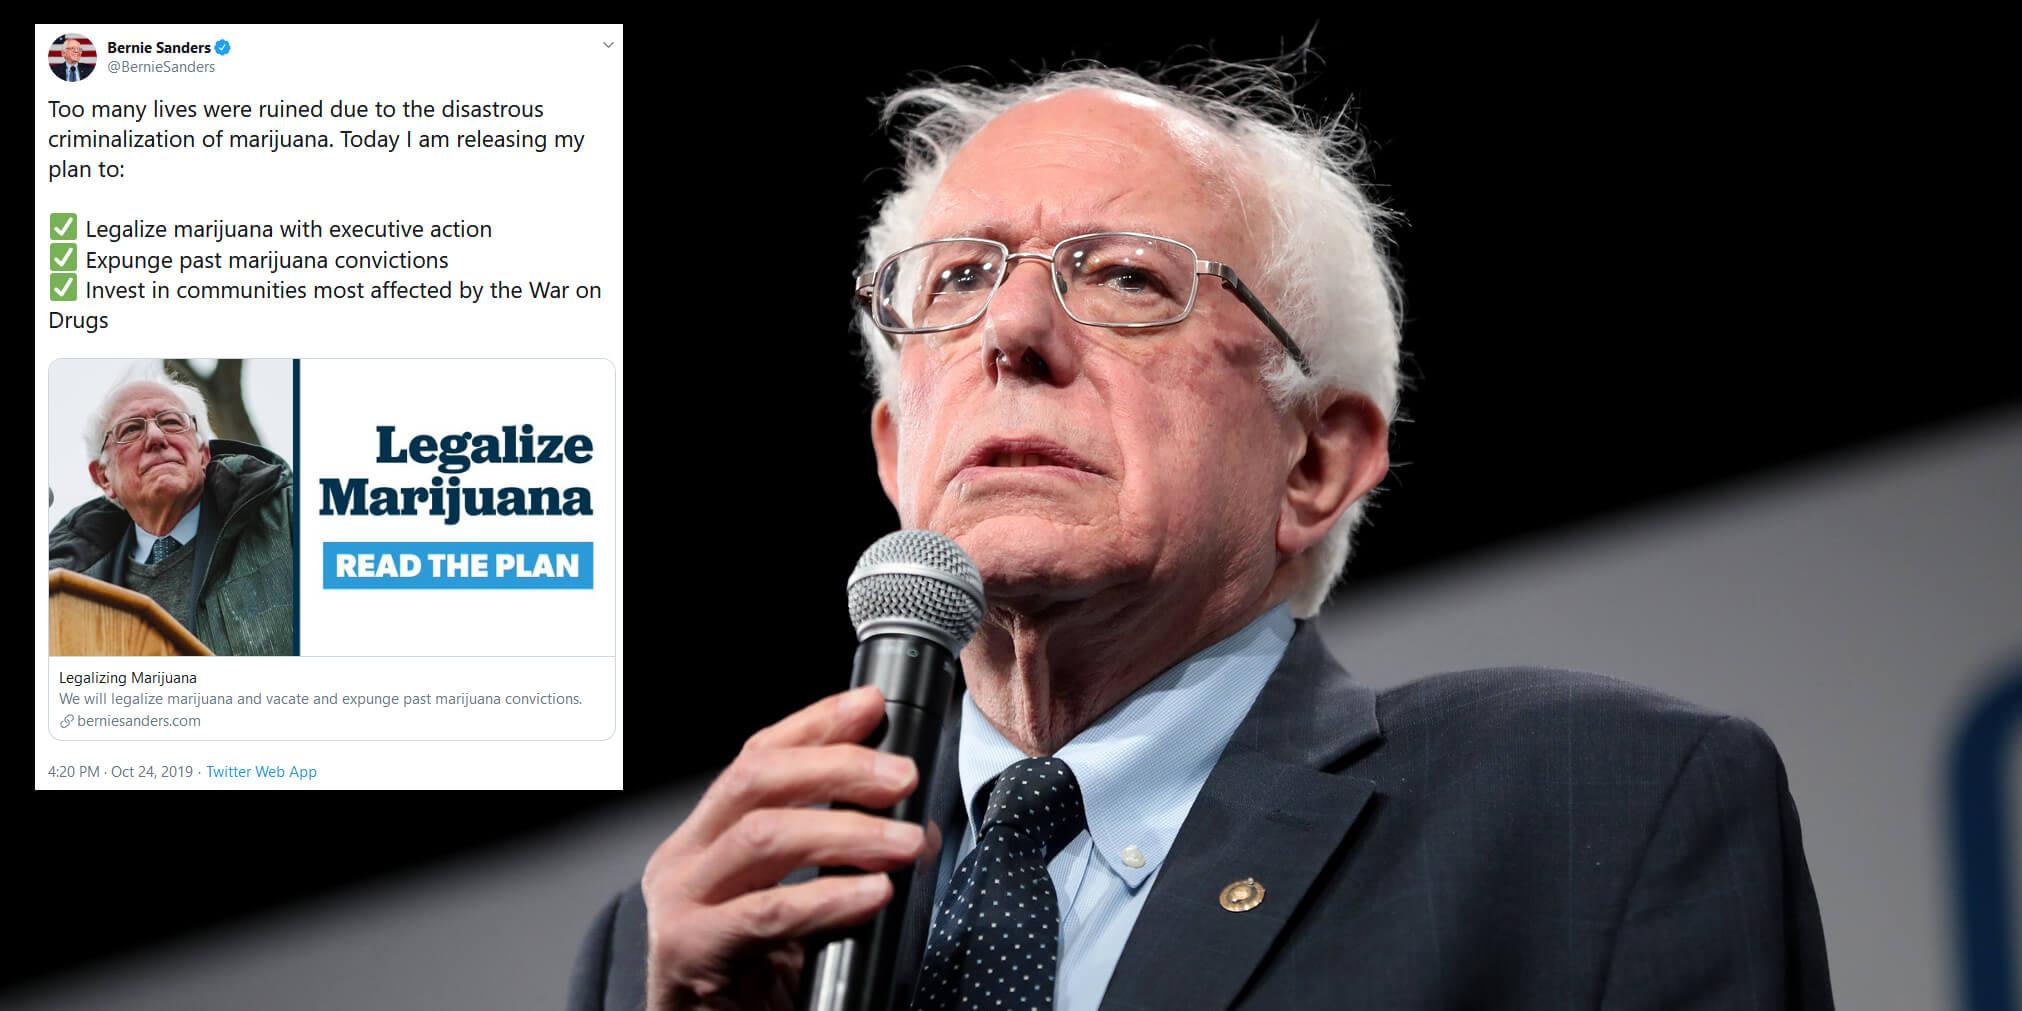 Bernie Sanders Plan to Roll-out Legalization of Marijuana